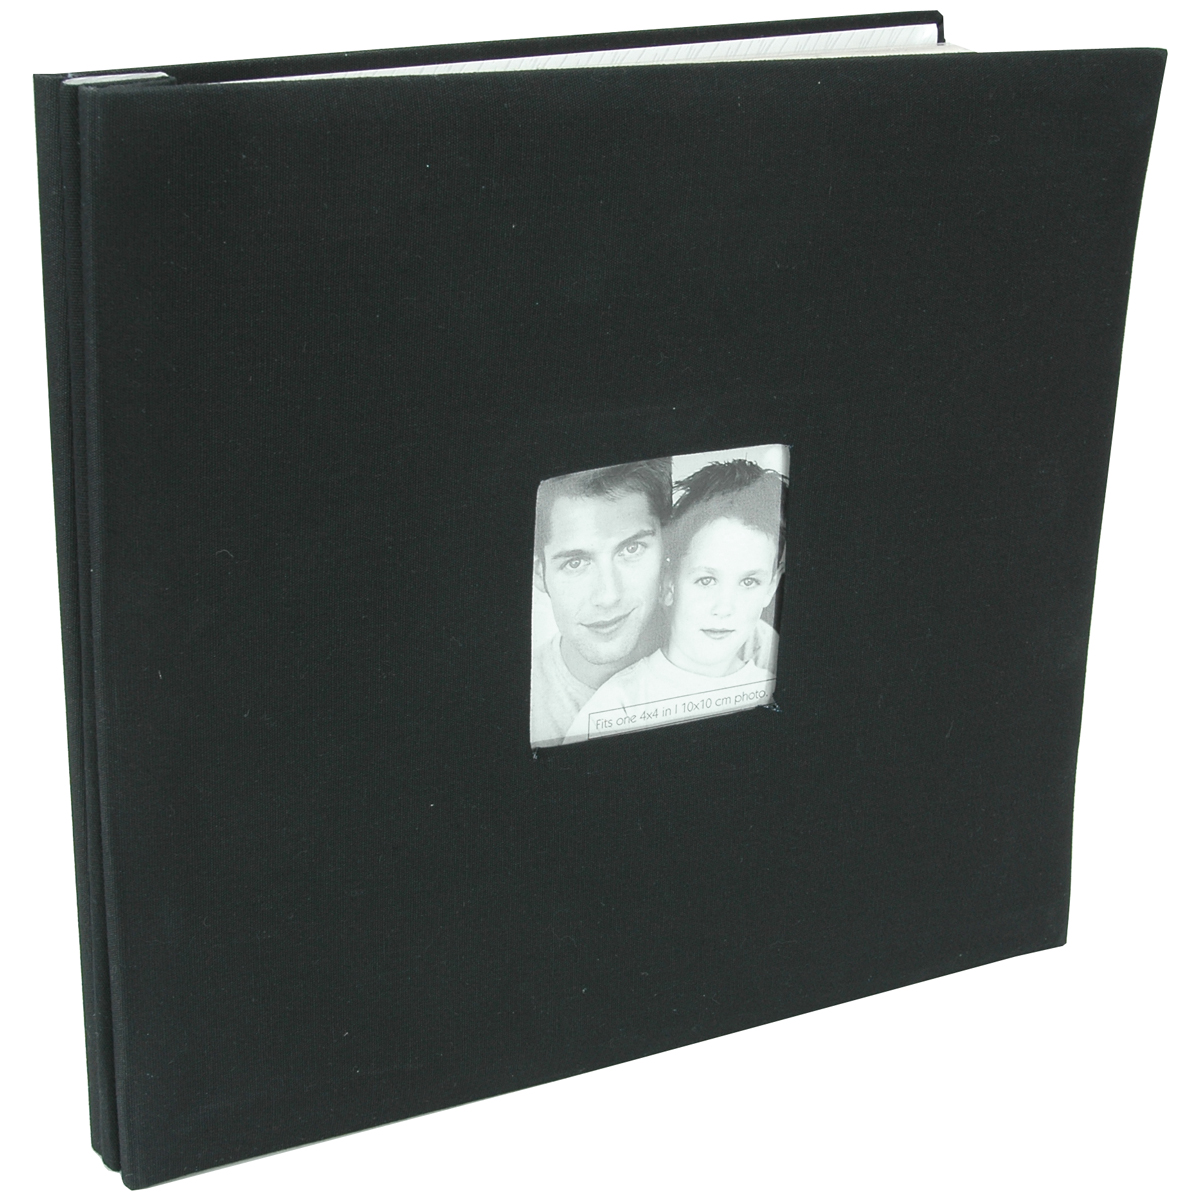 MBI Fashion Fabric Post Bound Album W/Window 12X12-Black